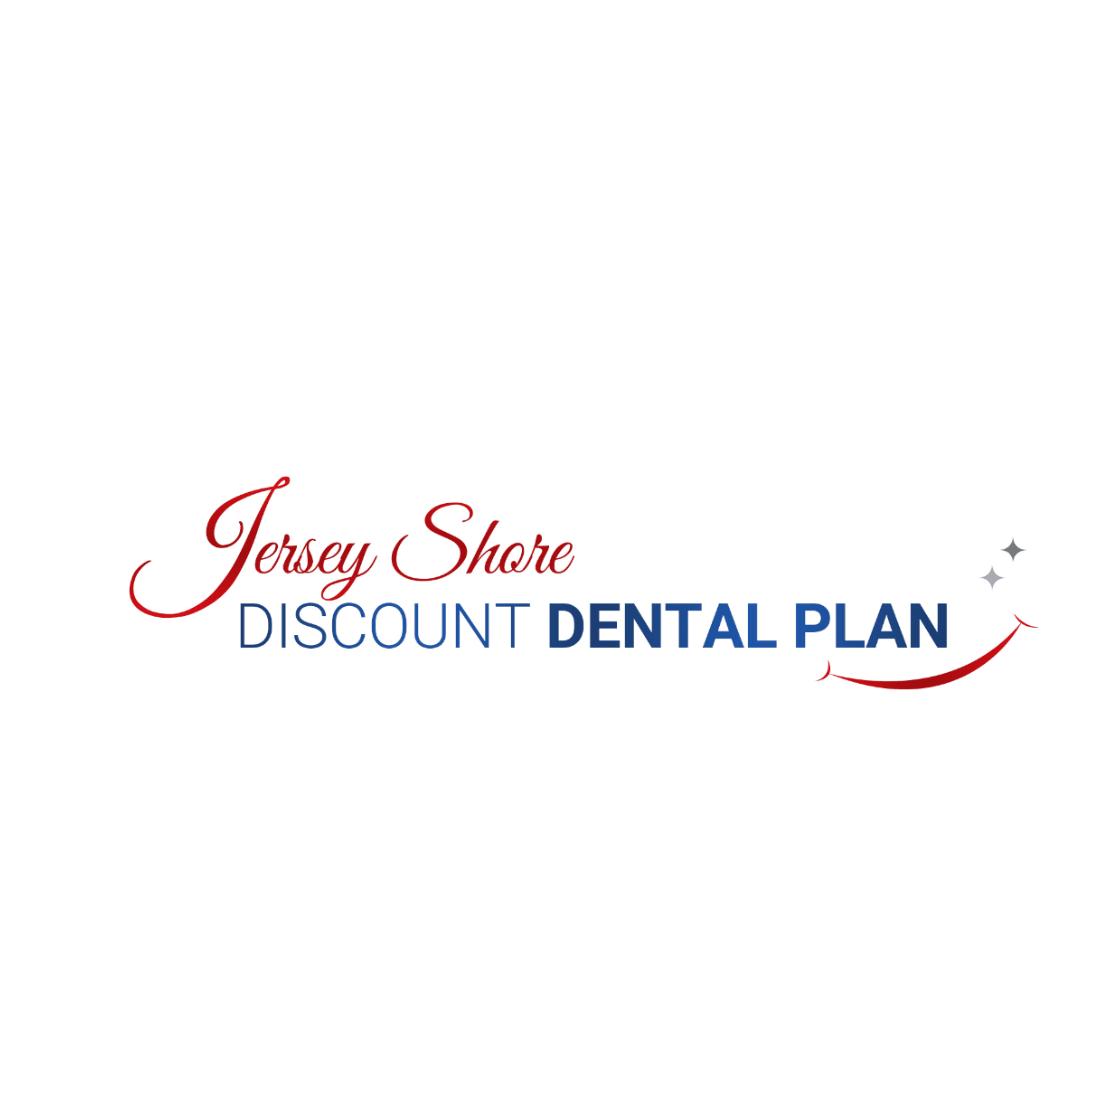 Jersey Shore Discount Dental